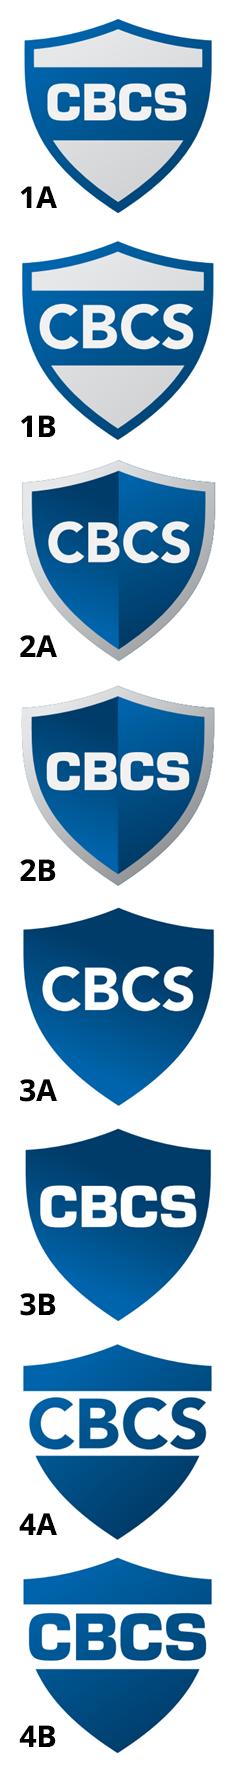 New CBCS Logo?.